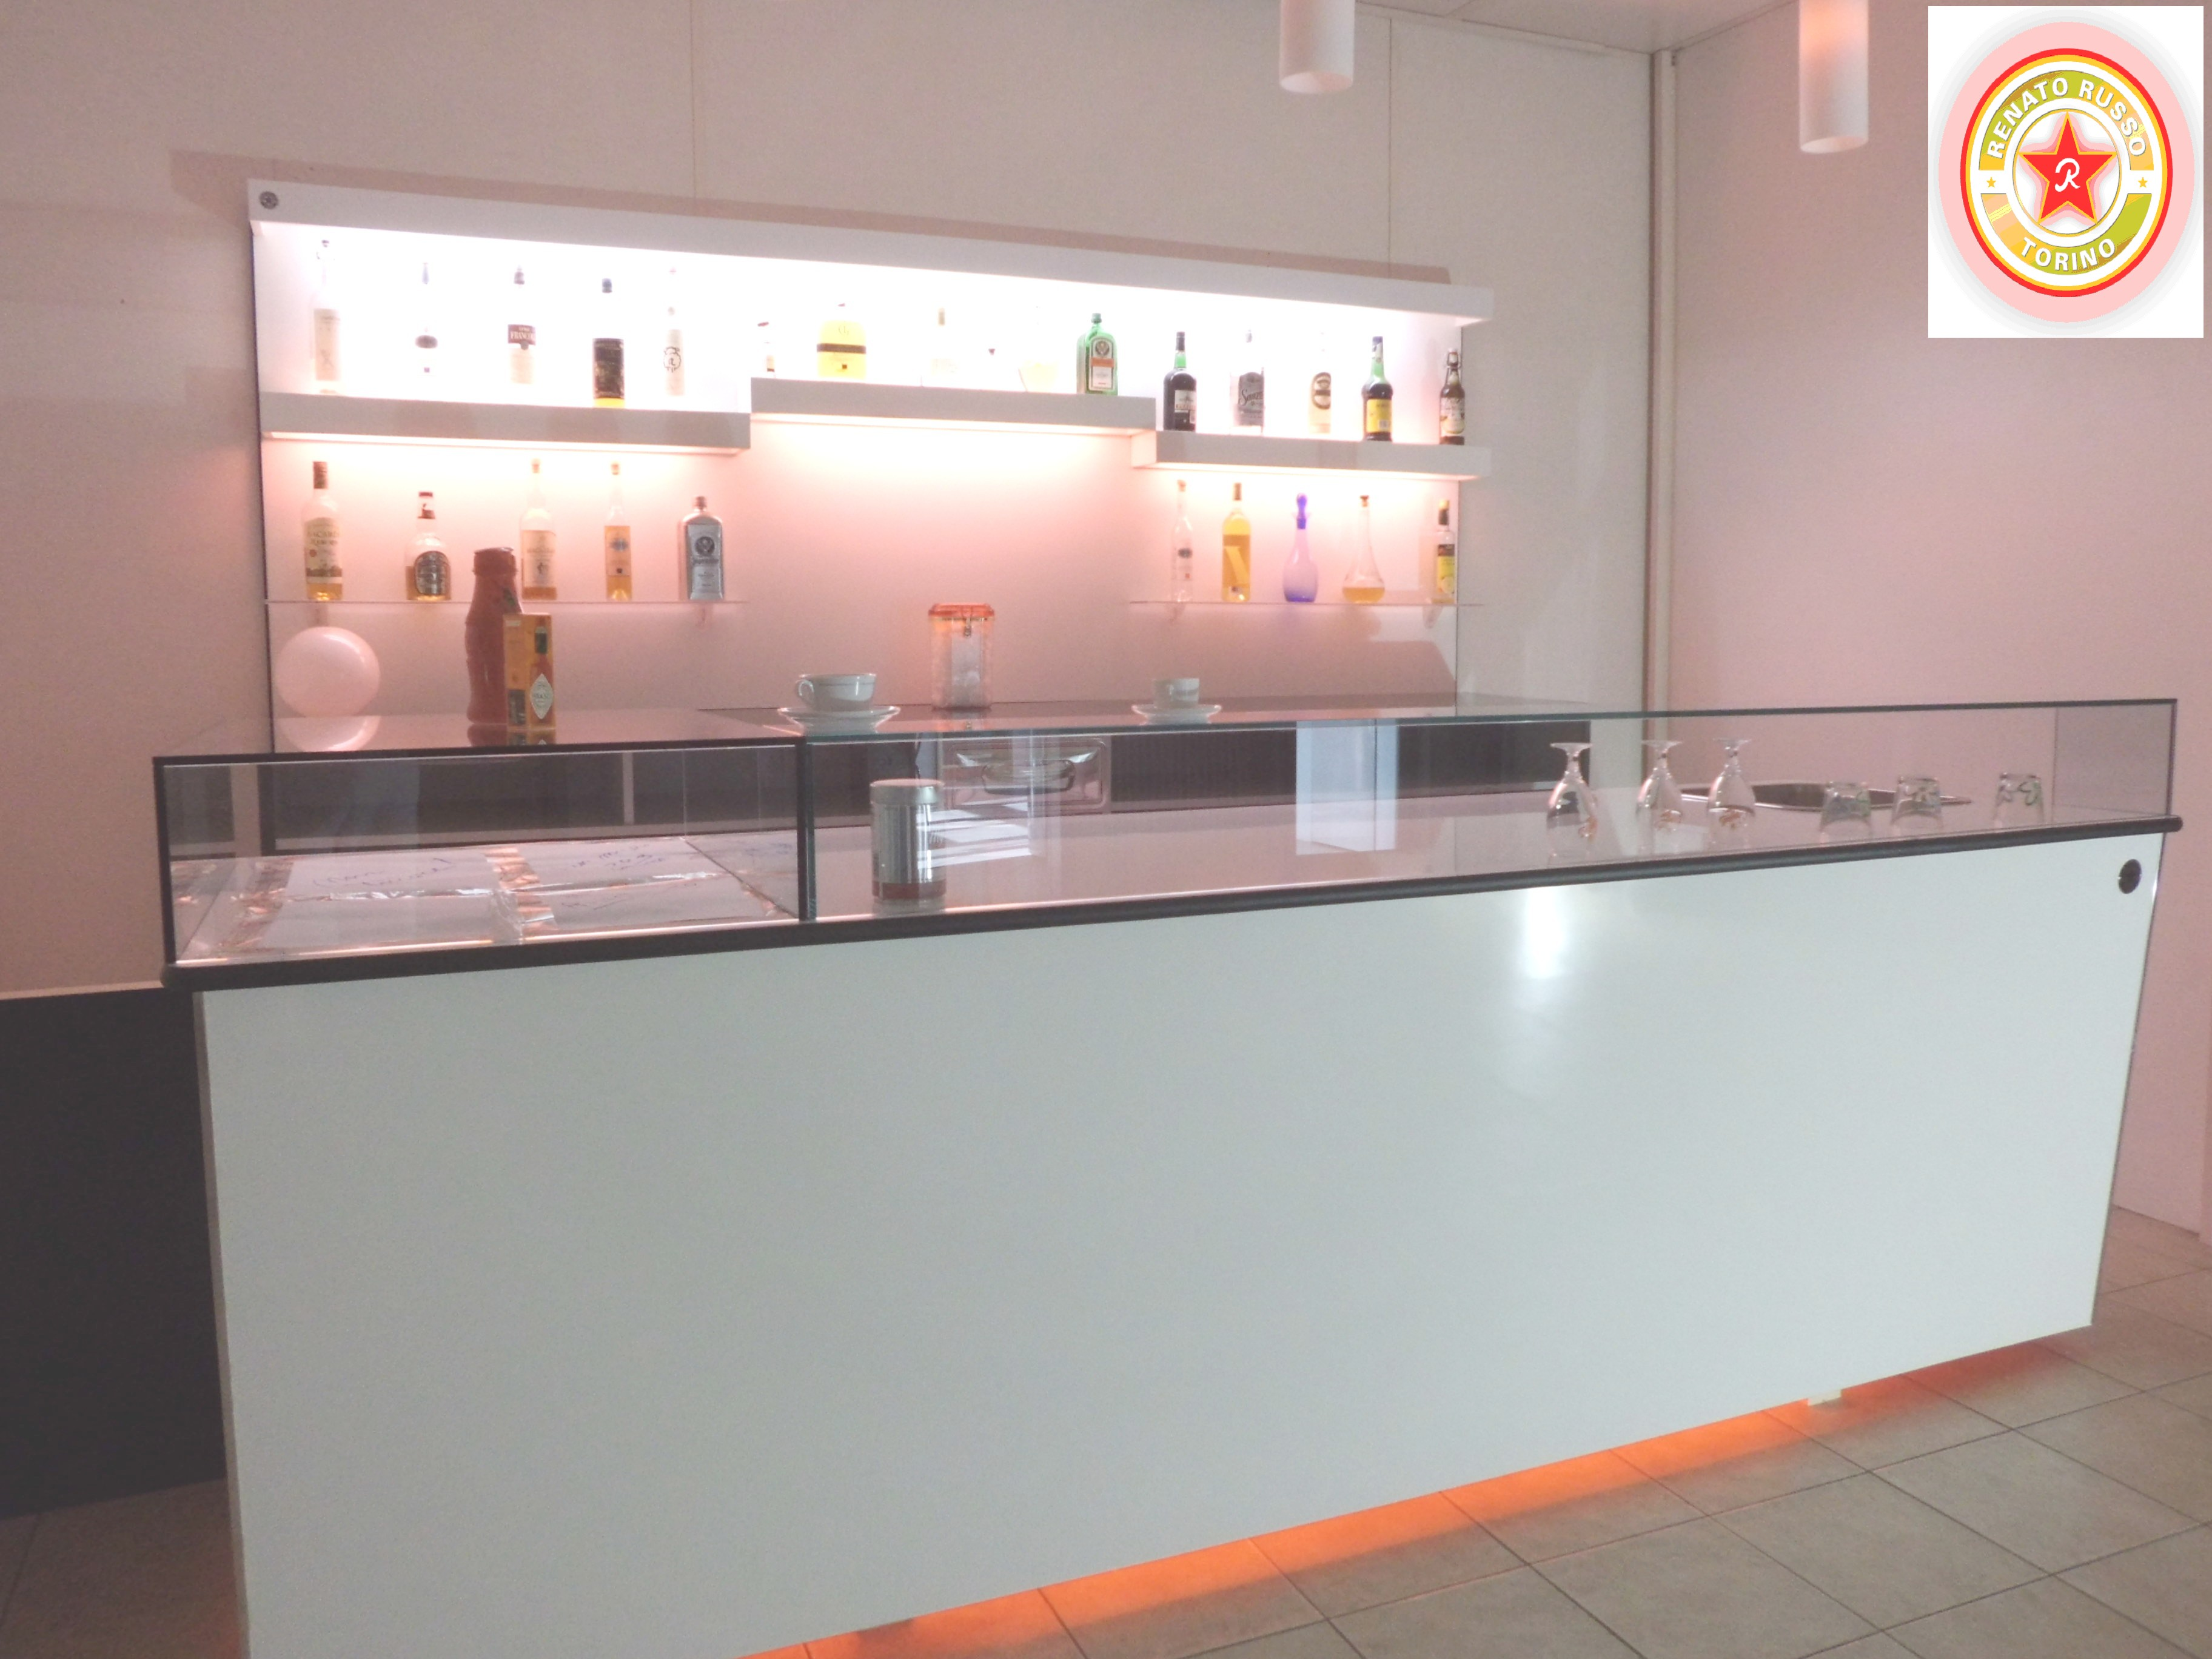 Banchi bar roma compra in fabbrica banconi bar for Banconi bar usati roma